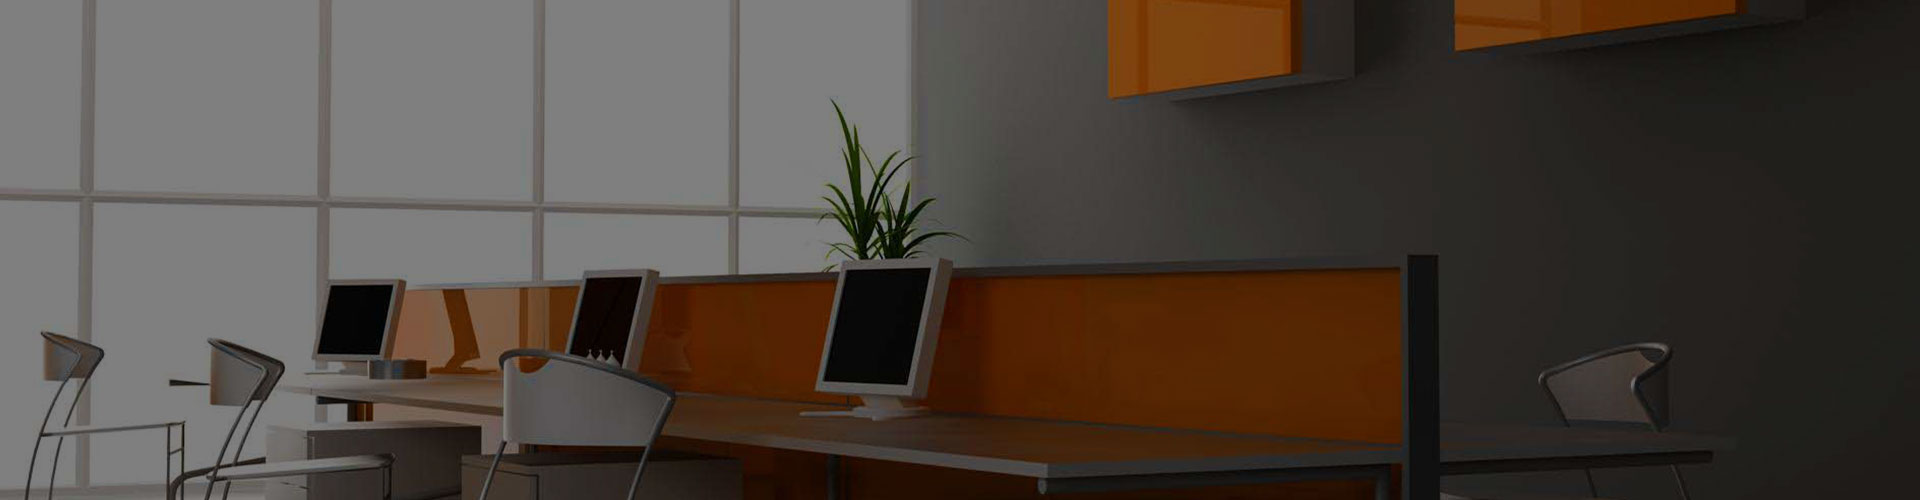 MHK-Print-Corp-Ident-Background-2